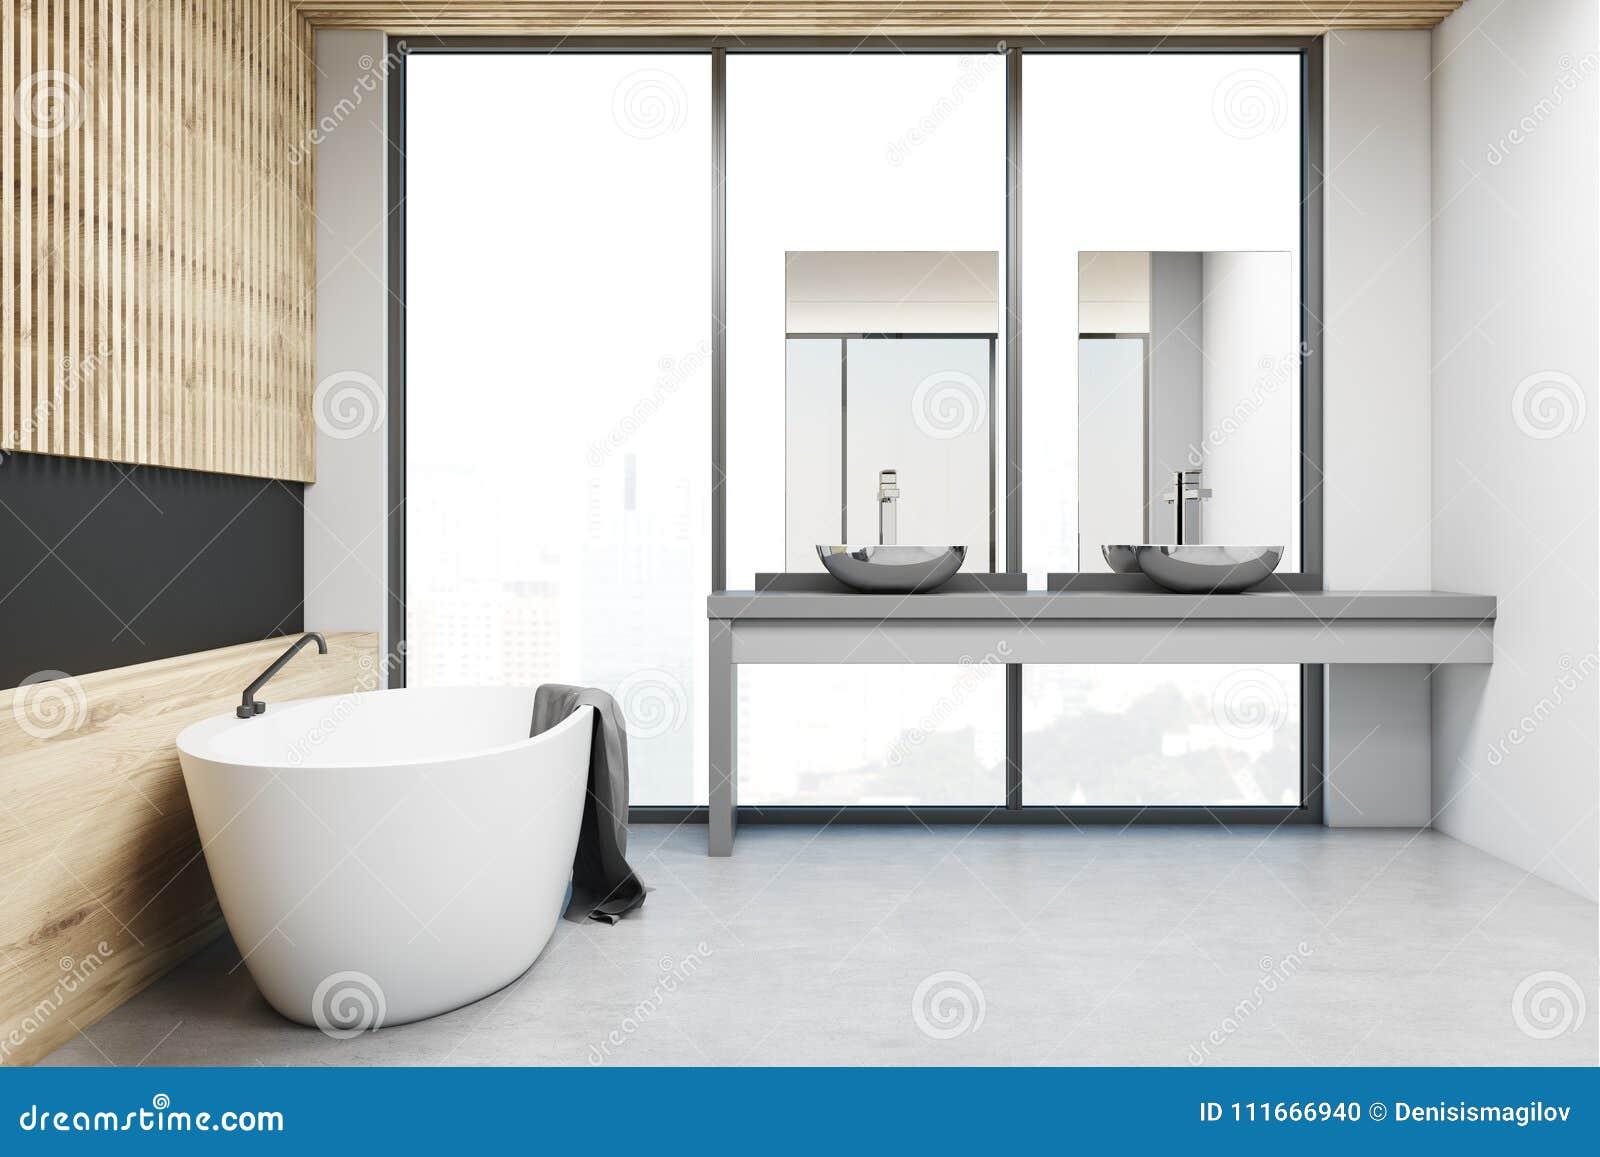 black modern bathroom toilet. Wooden And Black Modern Bathroom  Side View And Black Modern Bathroom Side View Stock Illustration